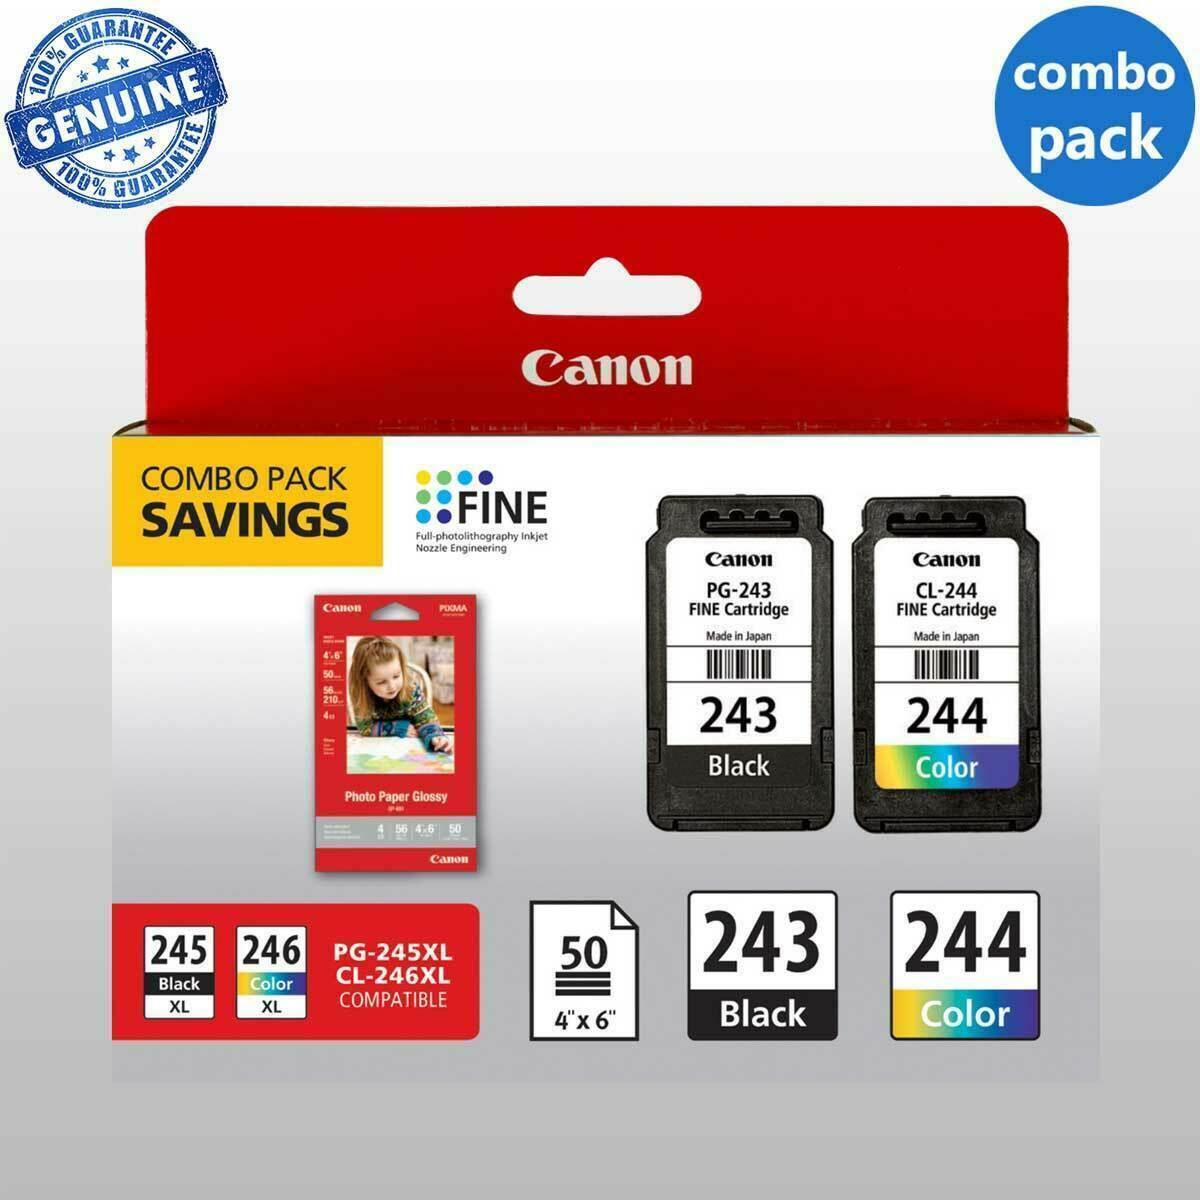 Original Combo Canon PG-243 CL-244 Black And Color  - $42.99